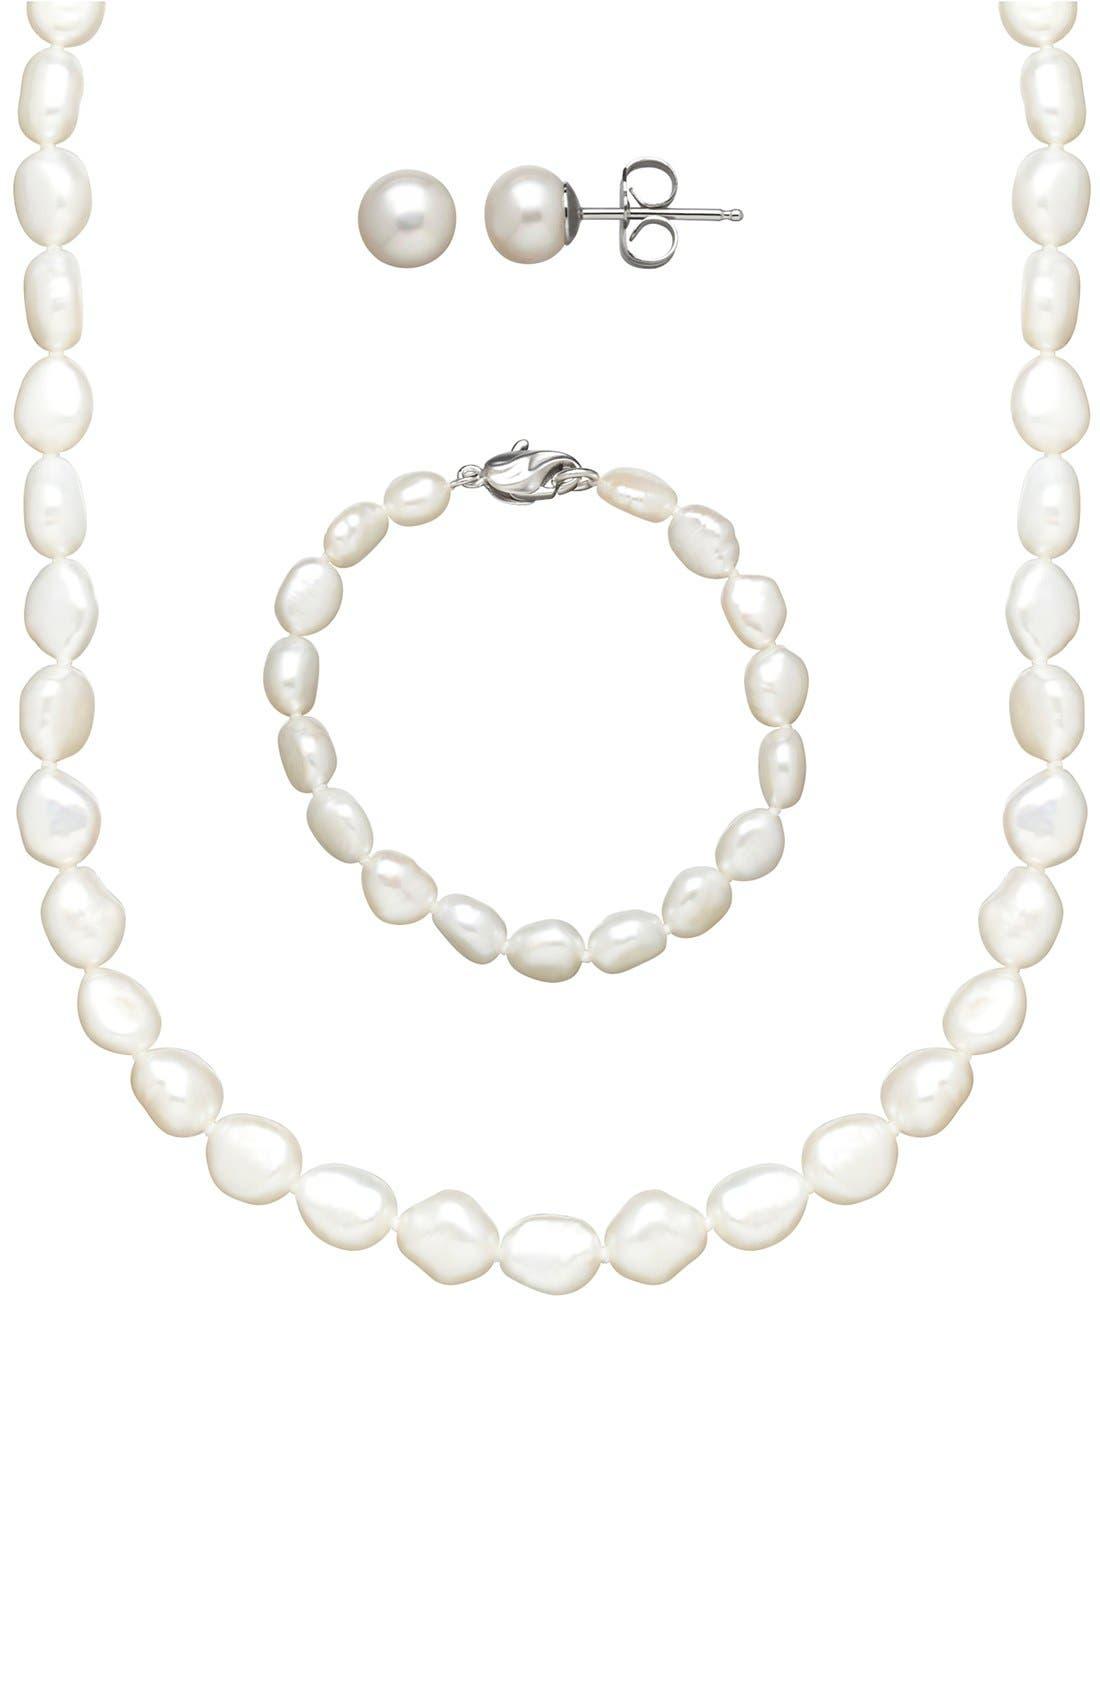 HONORA Freshwater Pearl Necklace, Bracelet & Earrings